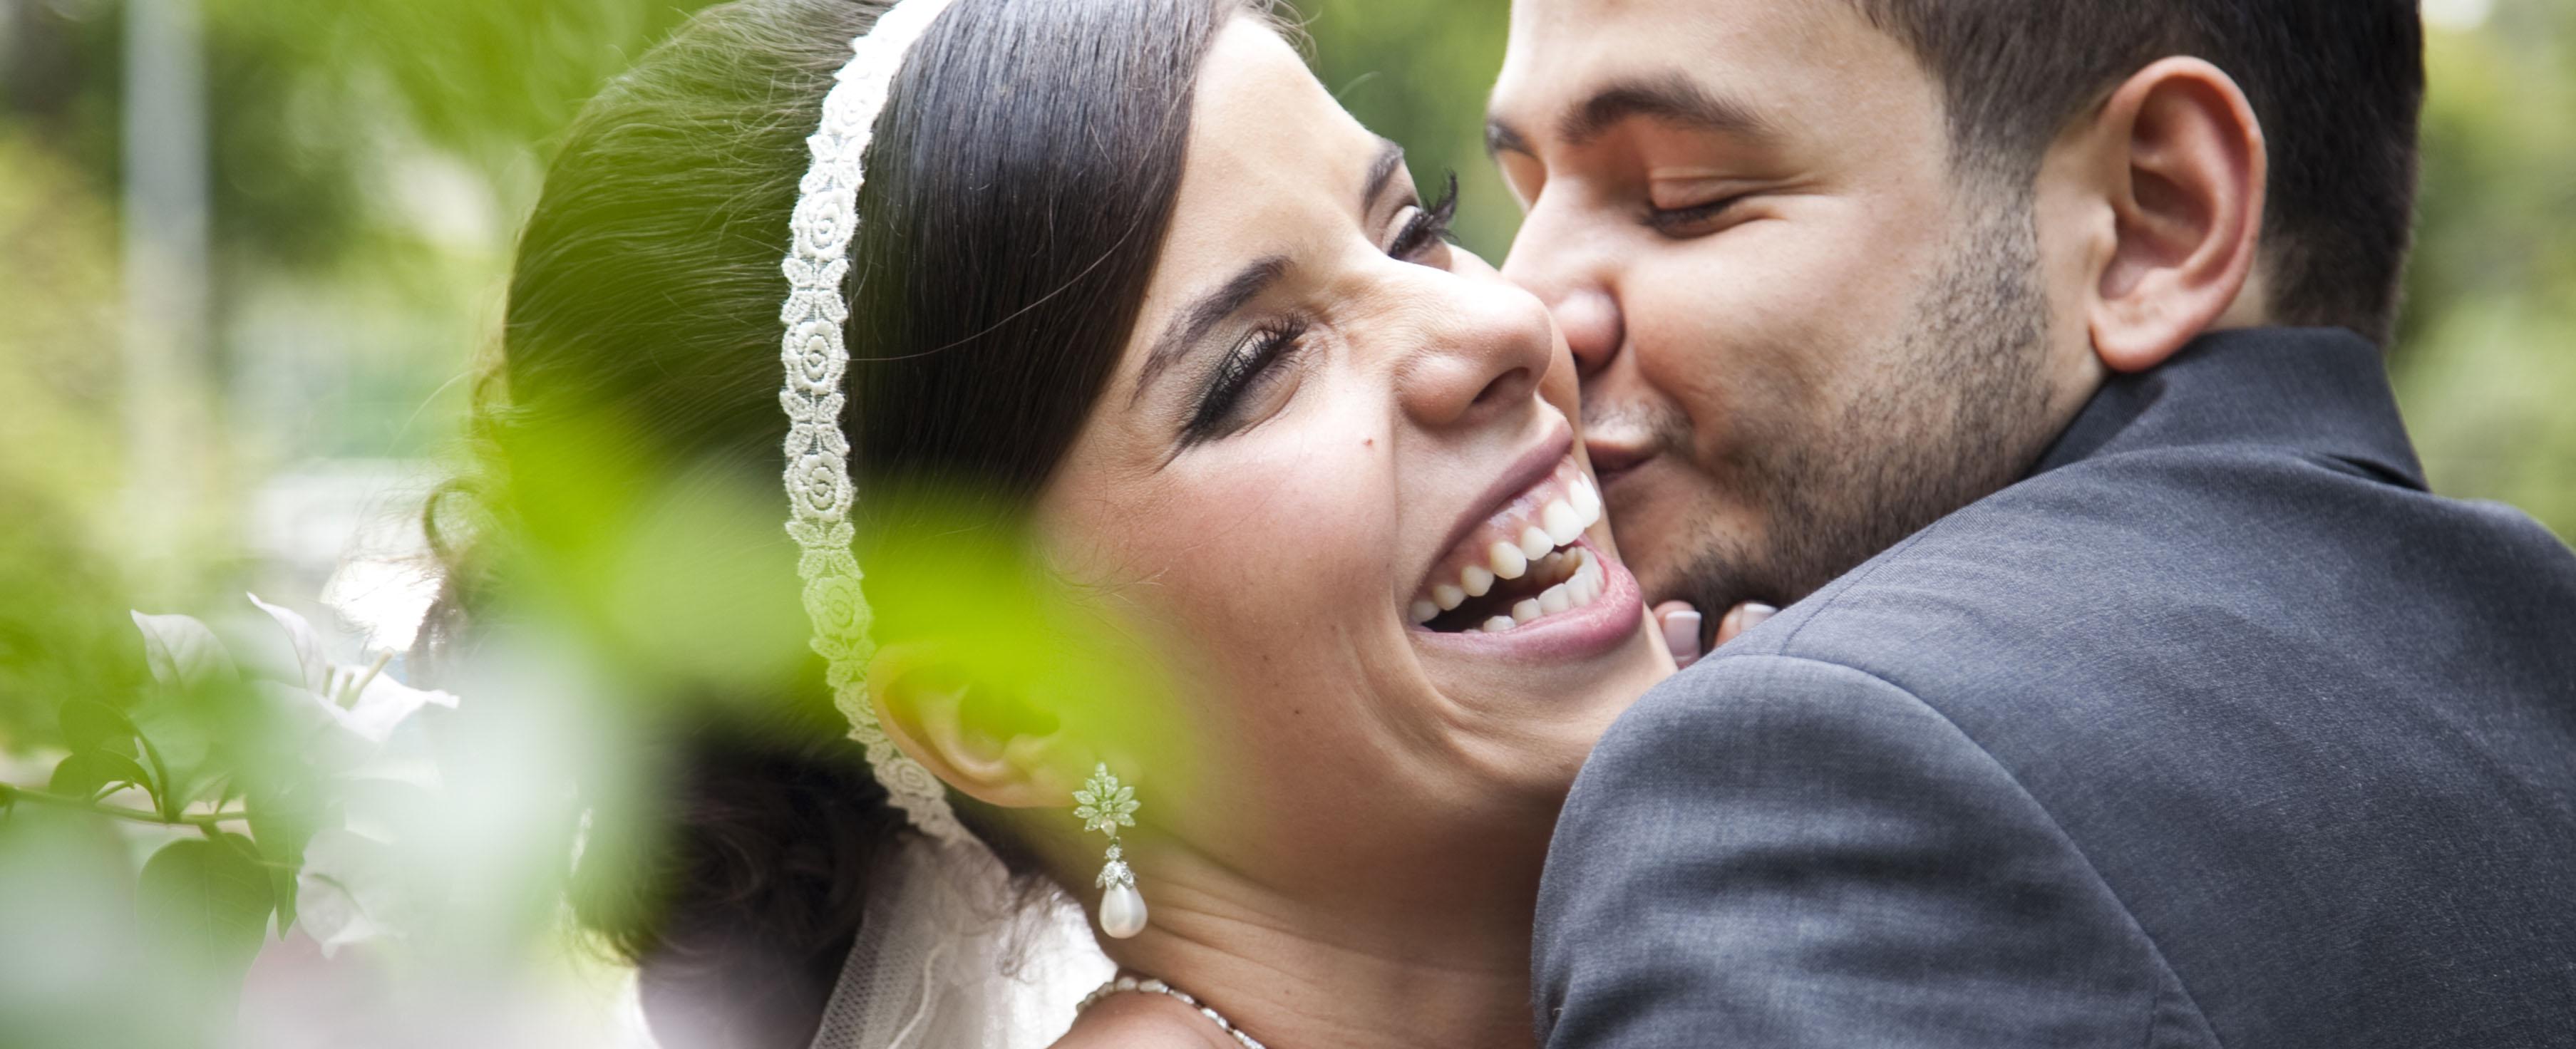 foto de casamento,  igreja cristo salva, casamento cristo salva, casamento igreja, casamento noite, vestido de noiva,  ensaio de noivos, fotos de noivos,